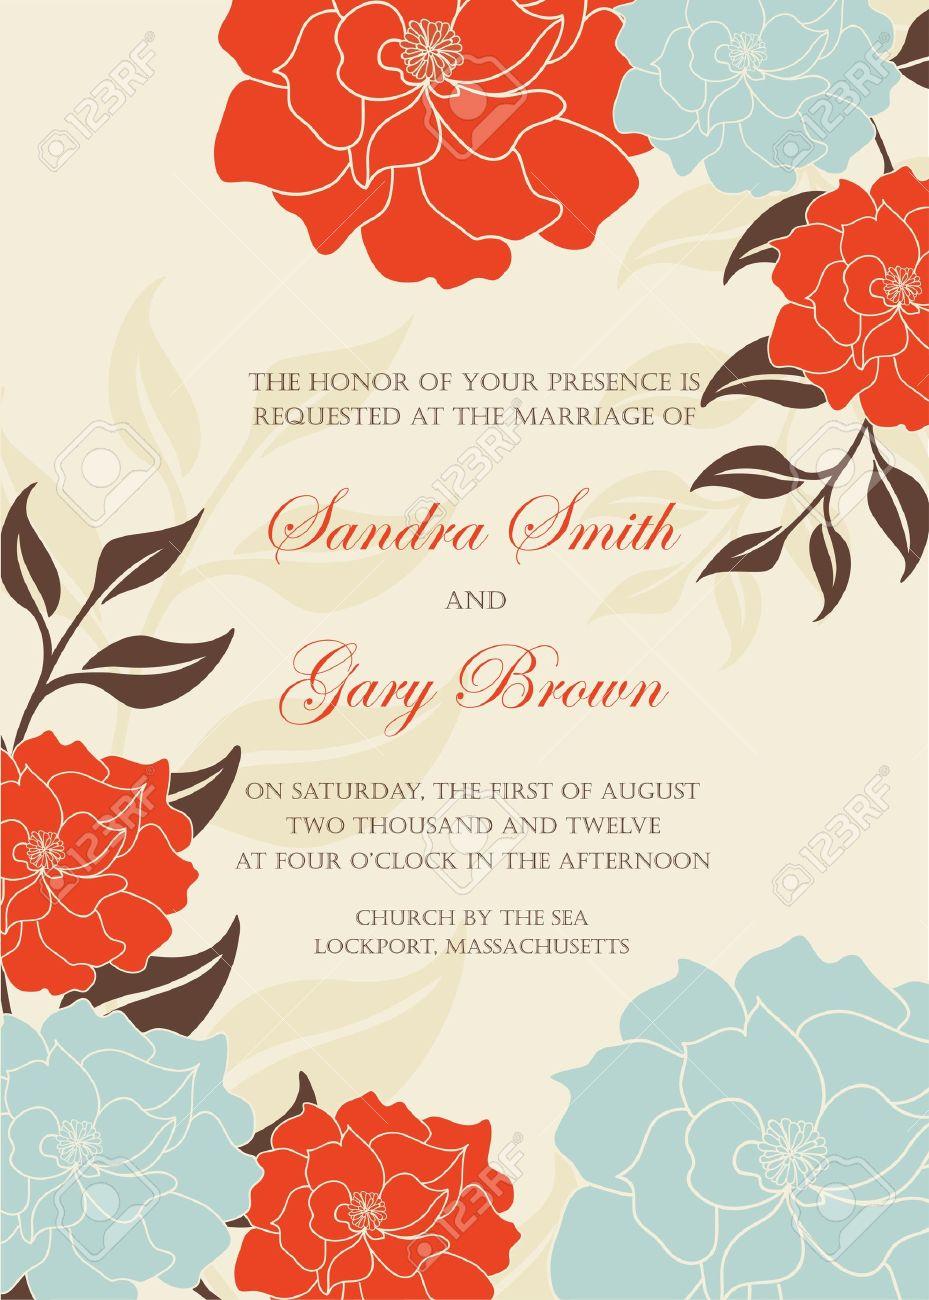 Floral wedding invitation template illustration Stock Vector - 20358170